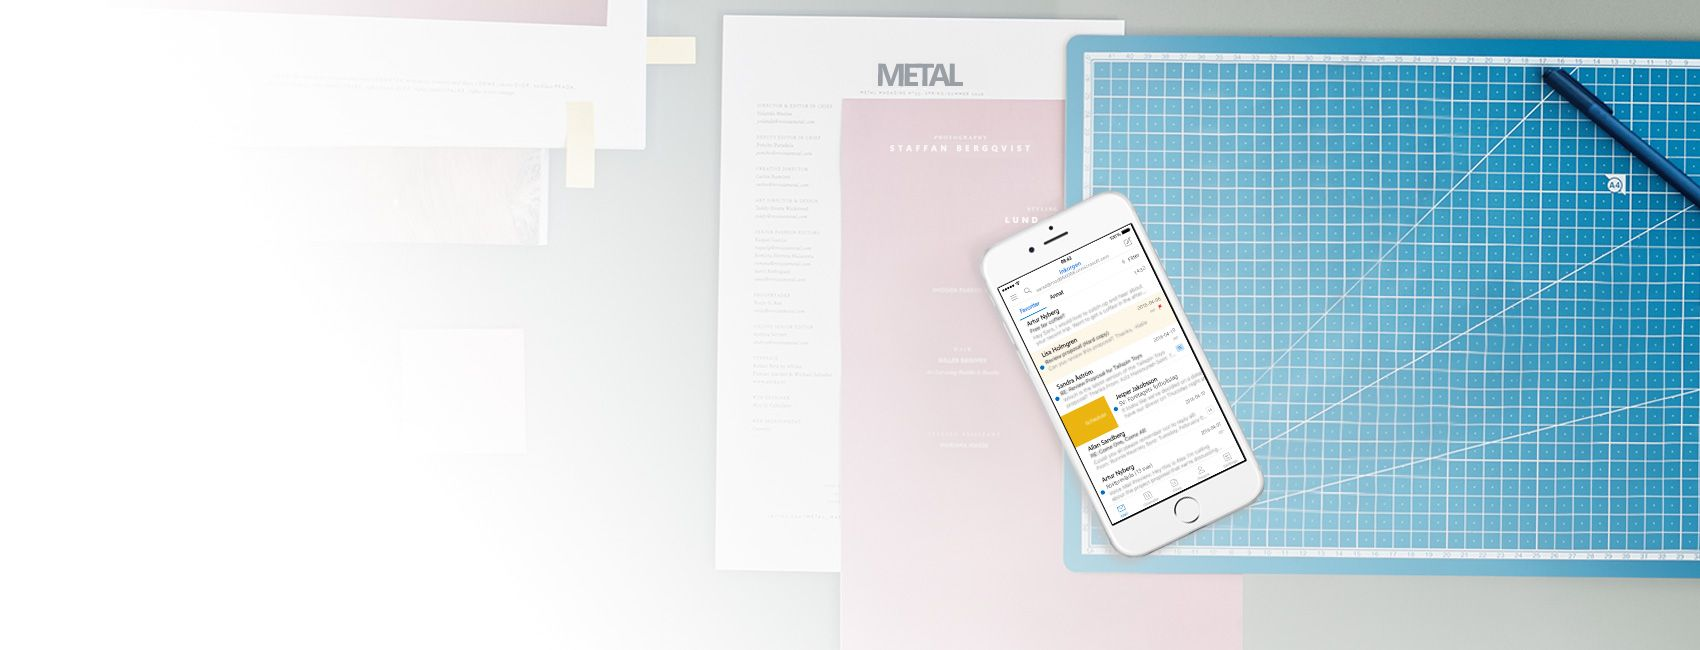 En telefon med en inkorg i Outlook-appen